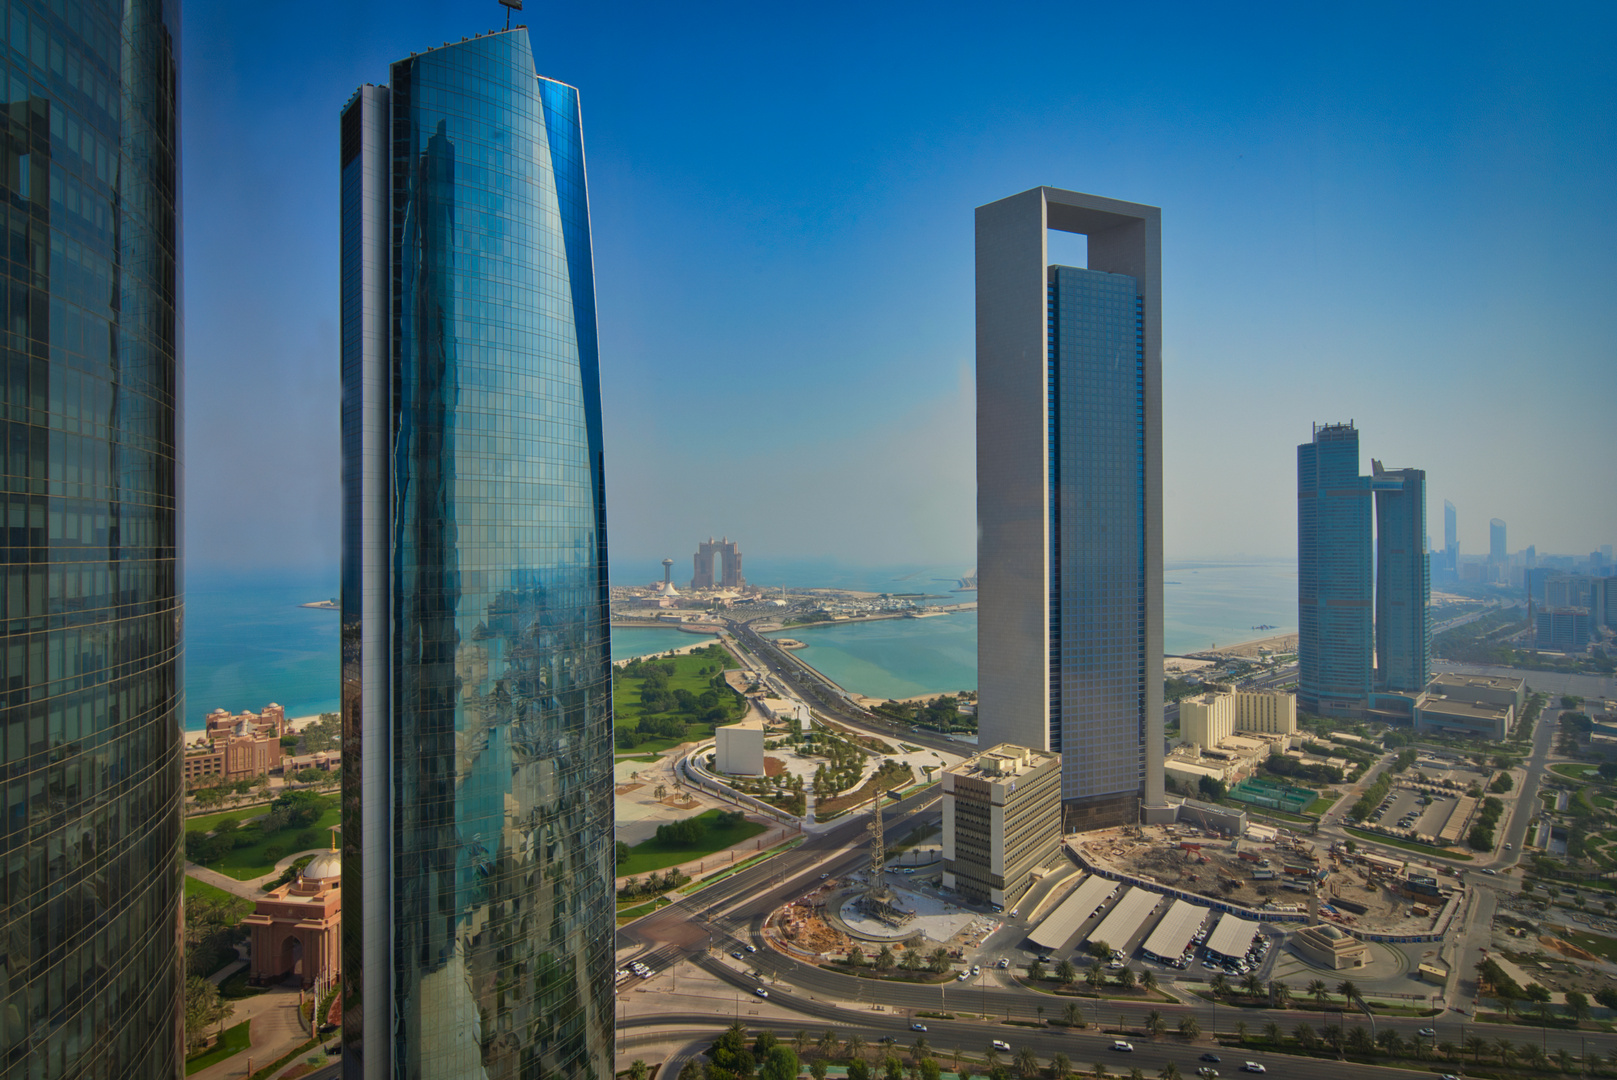 Etihad Towers View - Abu Dhabi